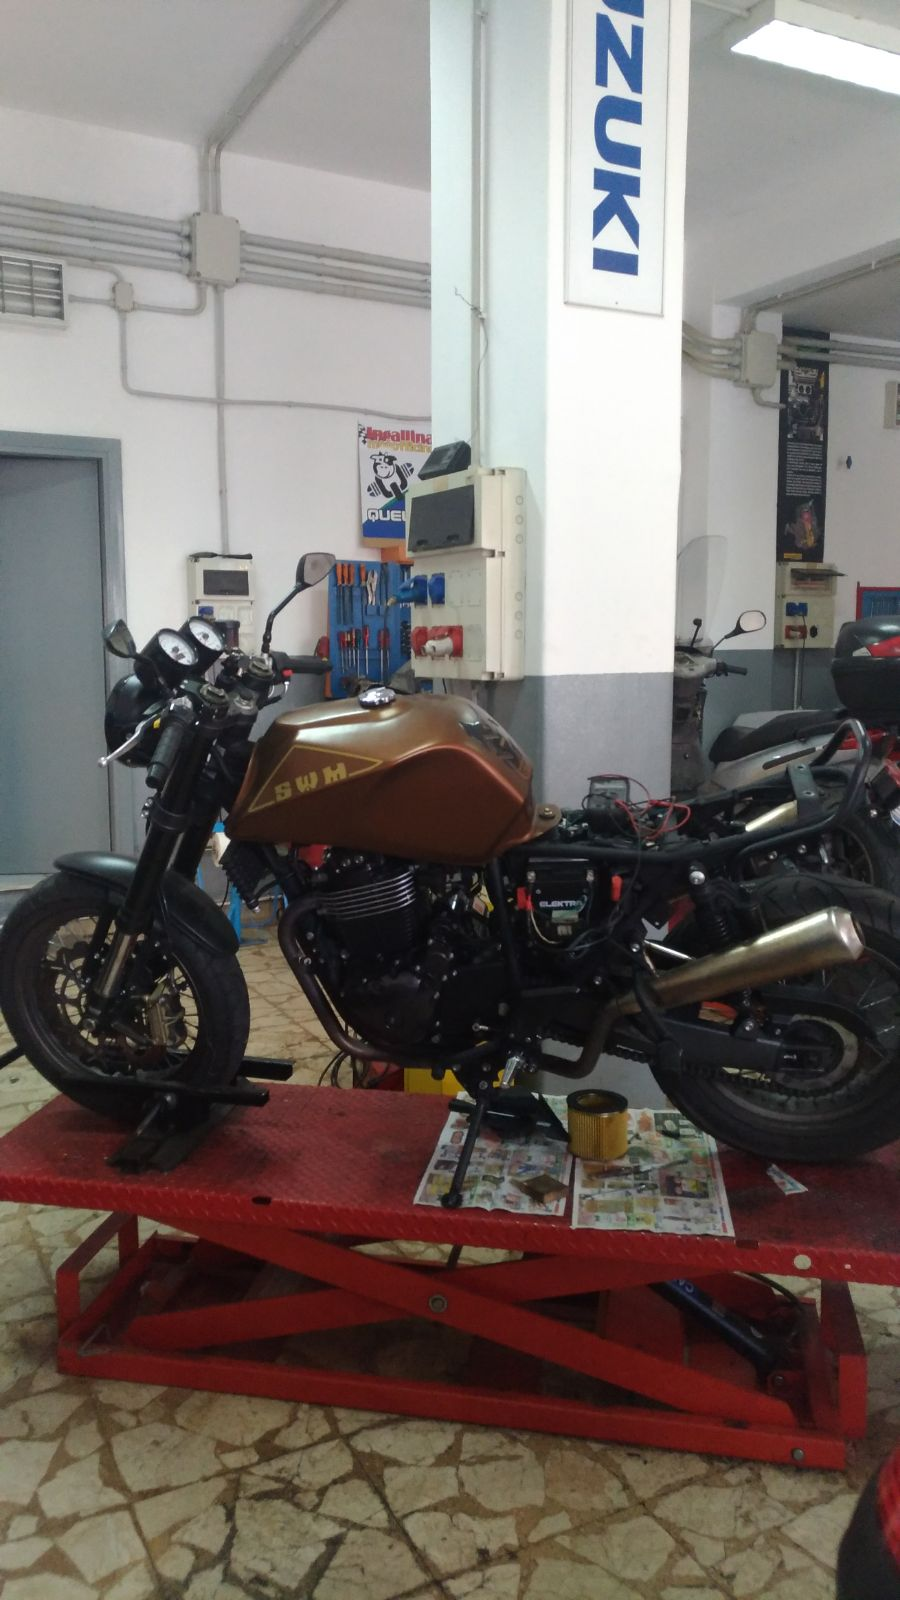 Diagnosi Moto S.w.M